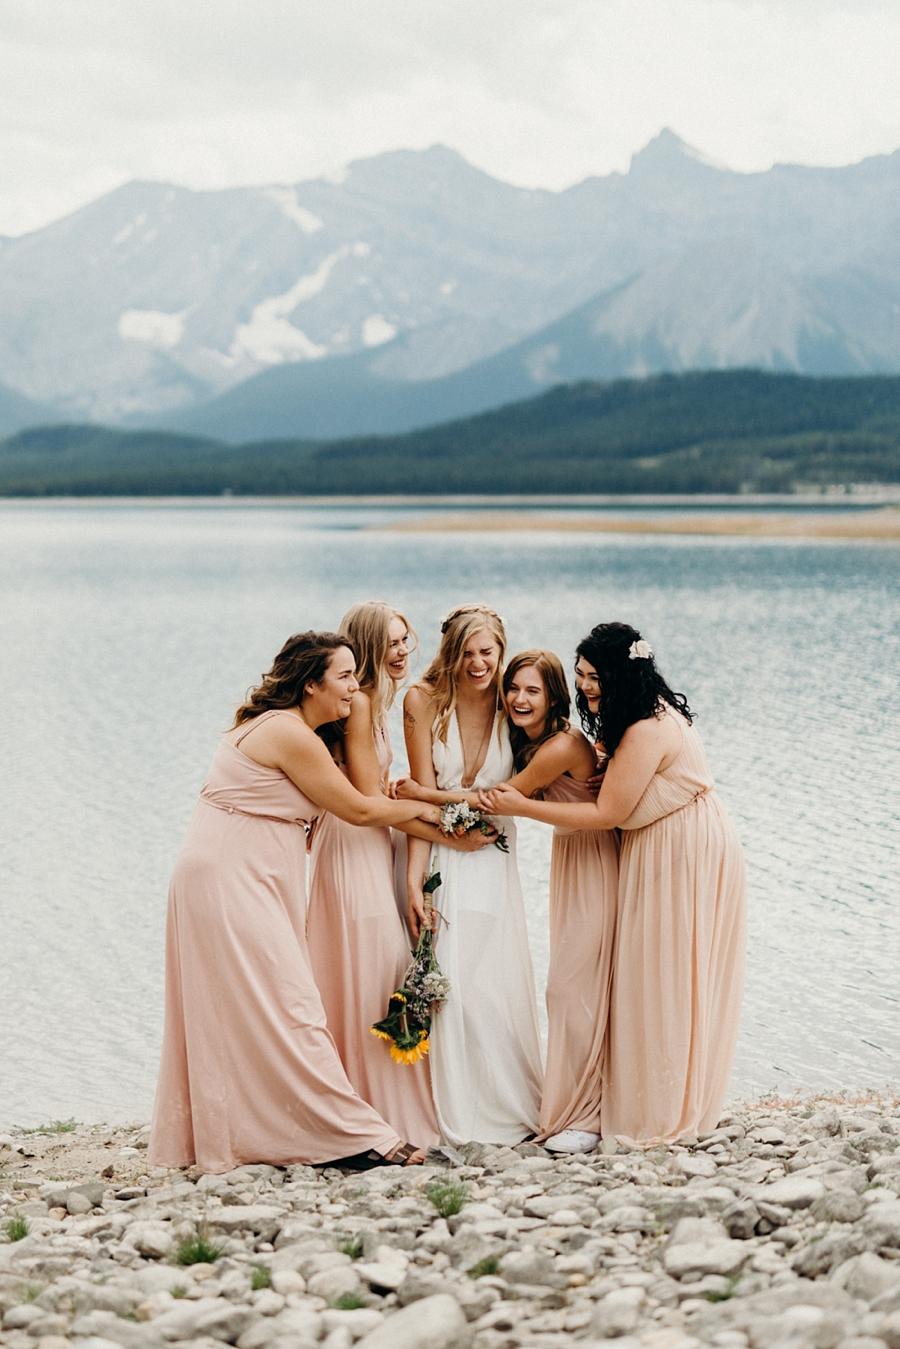 kaihla_tonai_intimate_wedding_elopement_photographer_7273.jpg